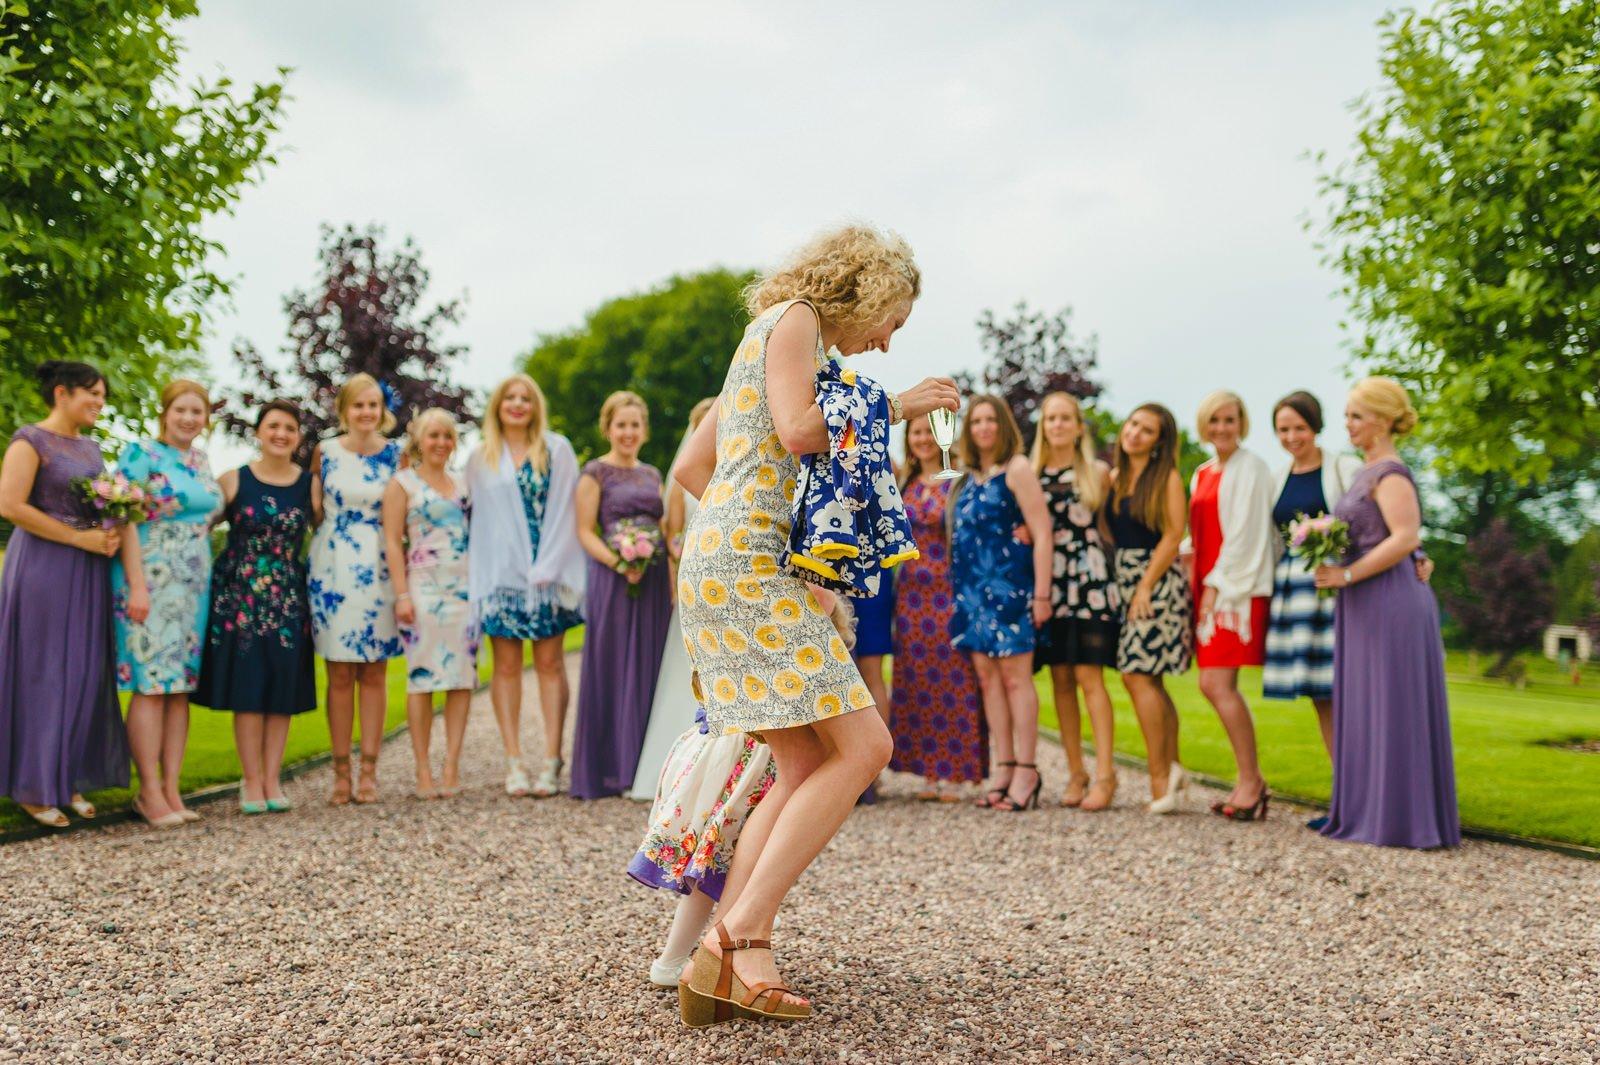 Millers Of Netley wedding, Dorrington, Shrewsbury | Emma + Ben 58